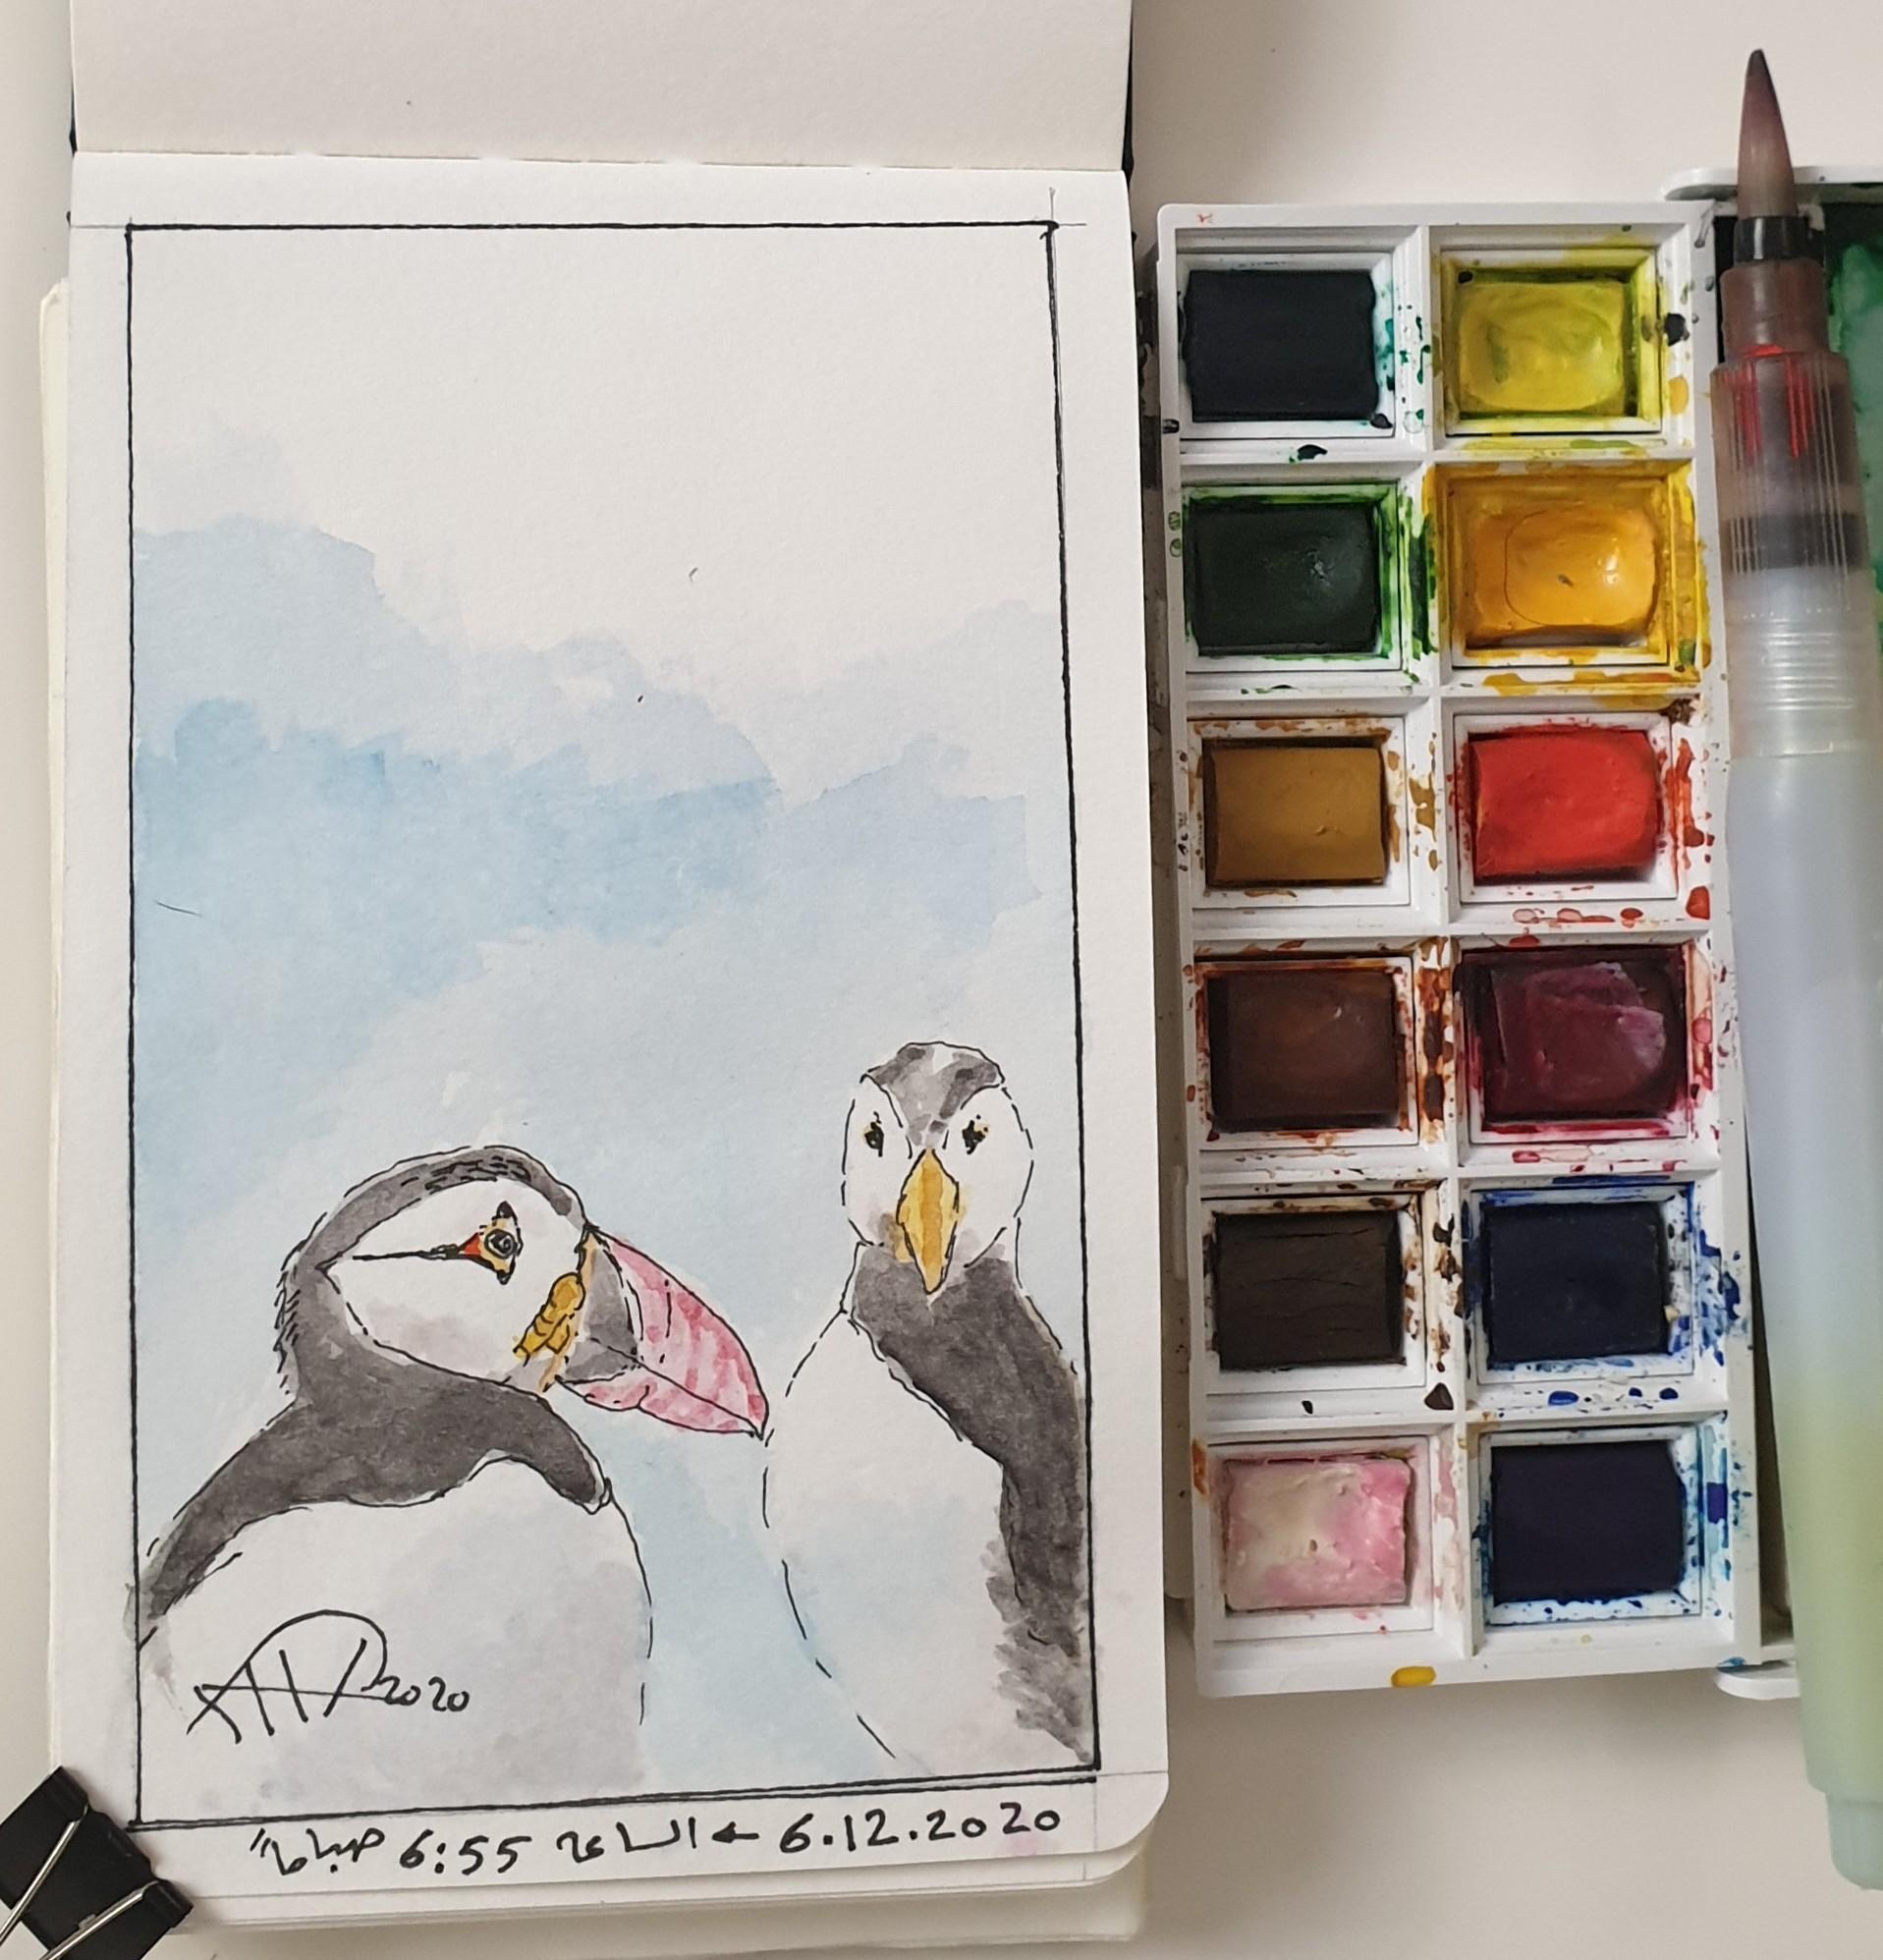 Ali radwani drawing sketch challenge 1hour1sketch pen pencil Coloring watercolor